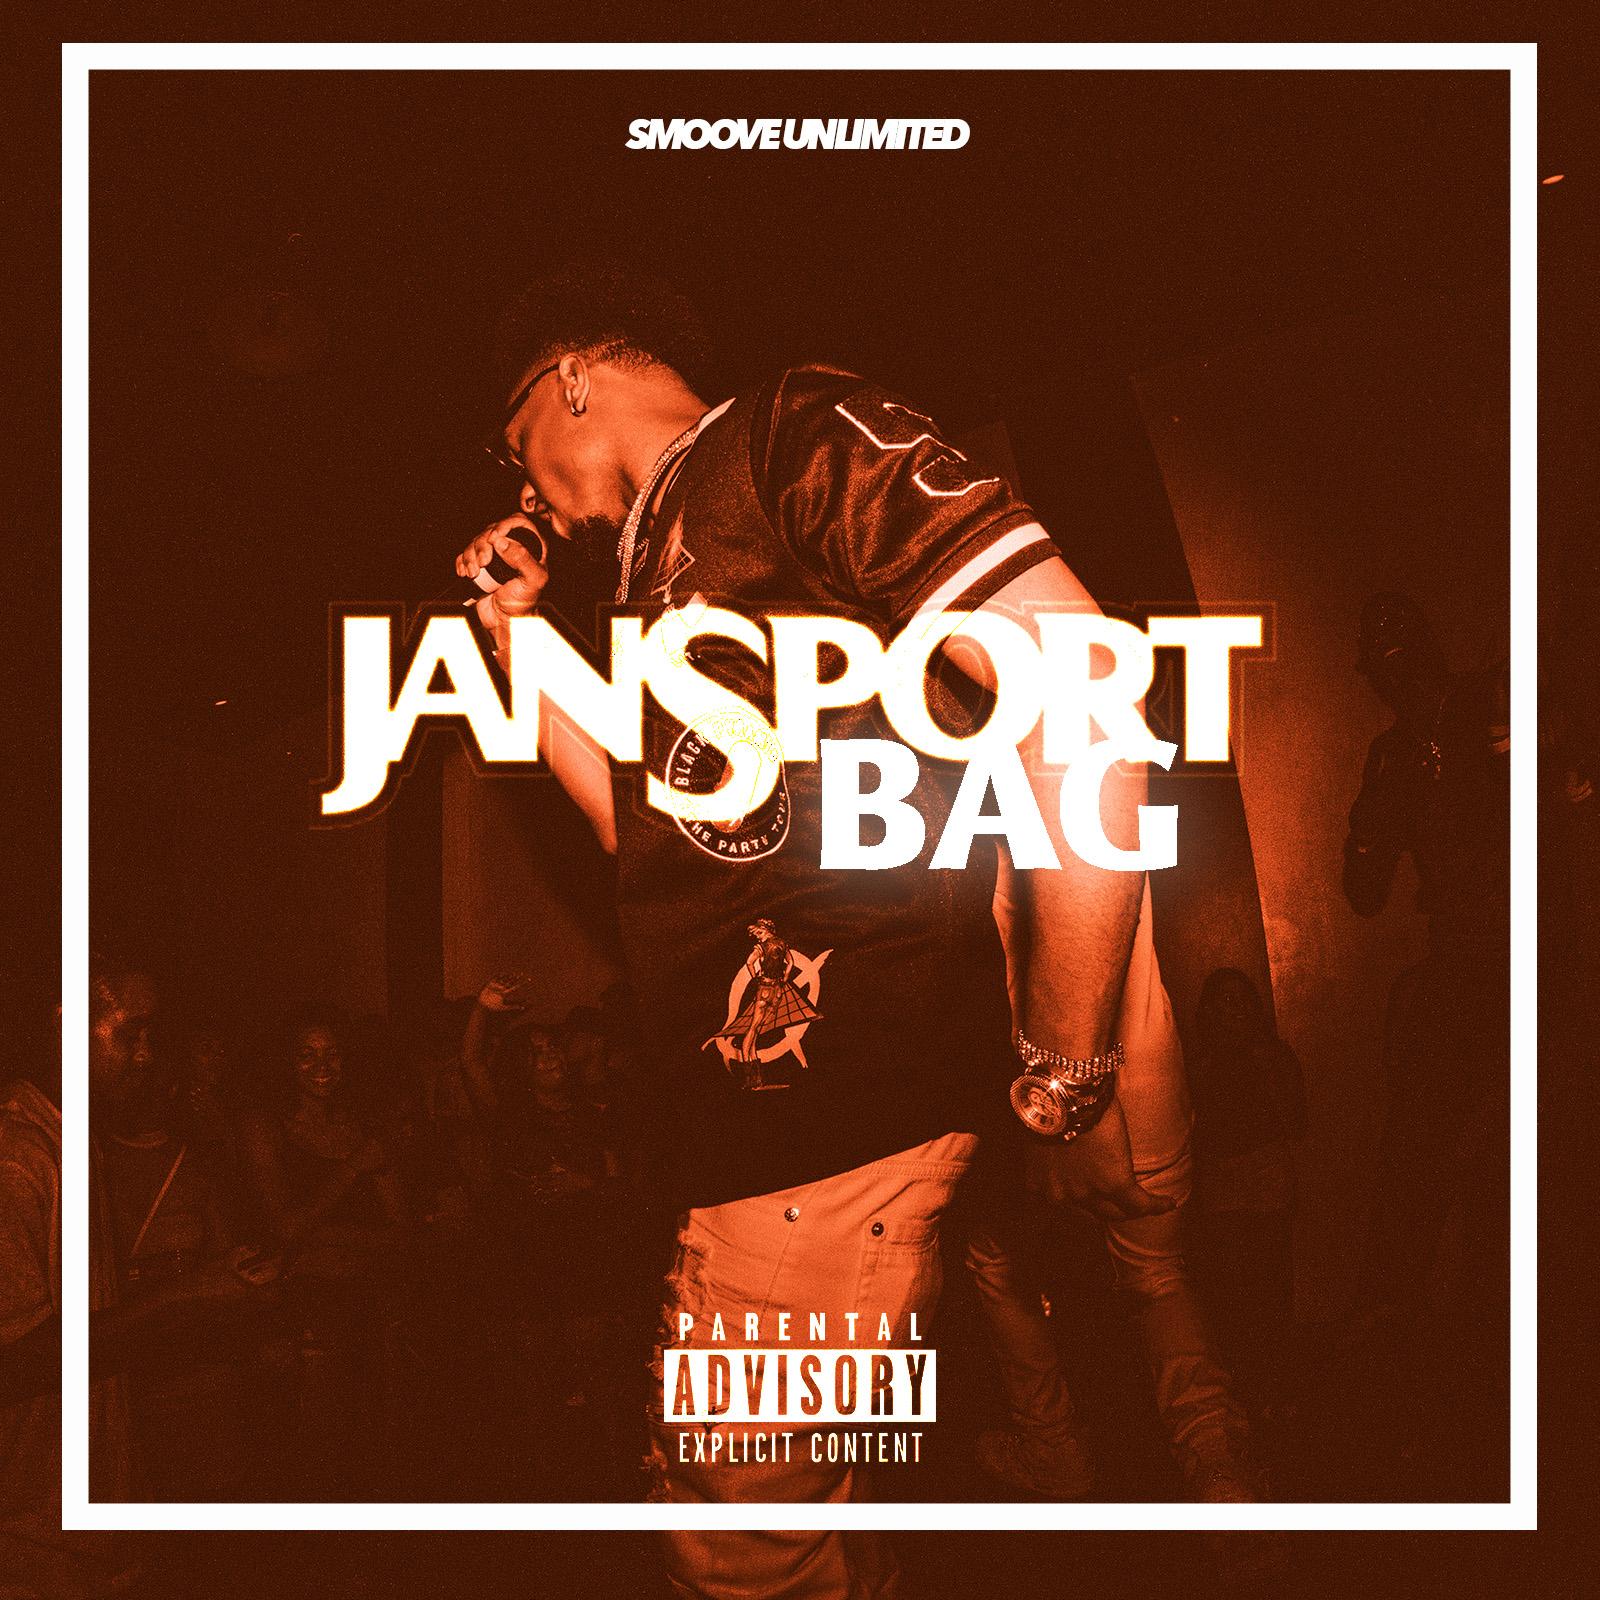 Jansport Bag - by Smoove Unlimited